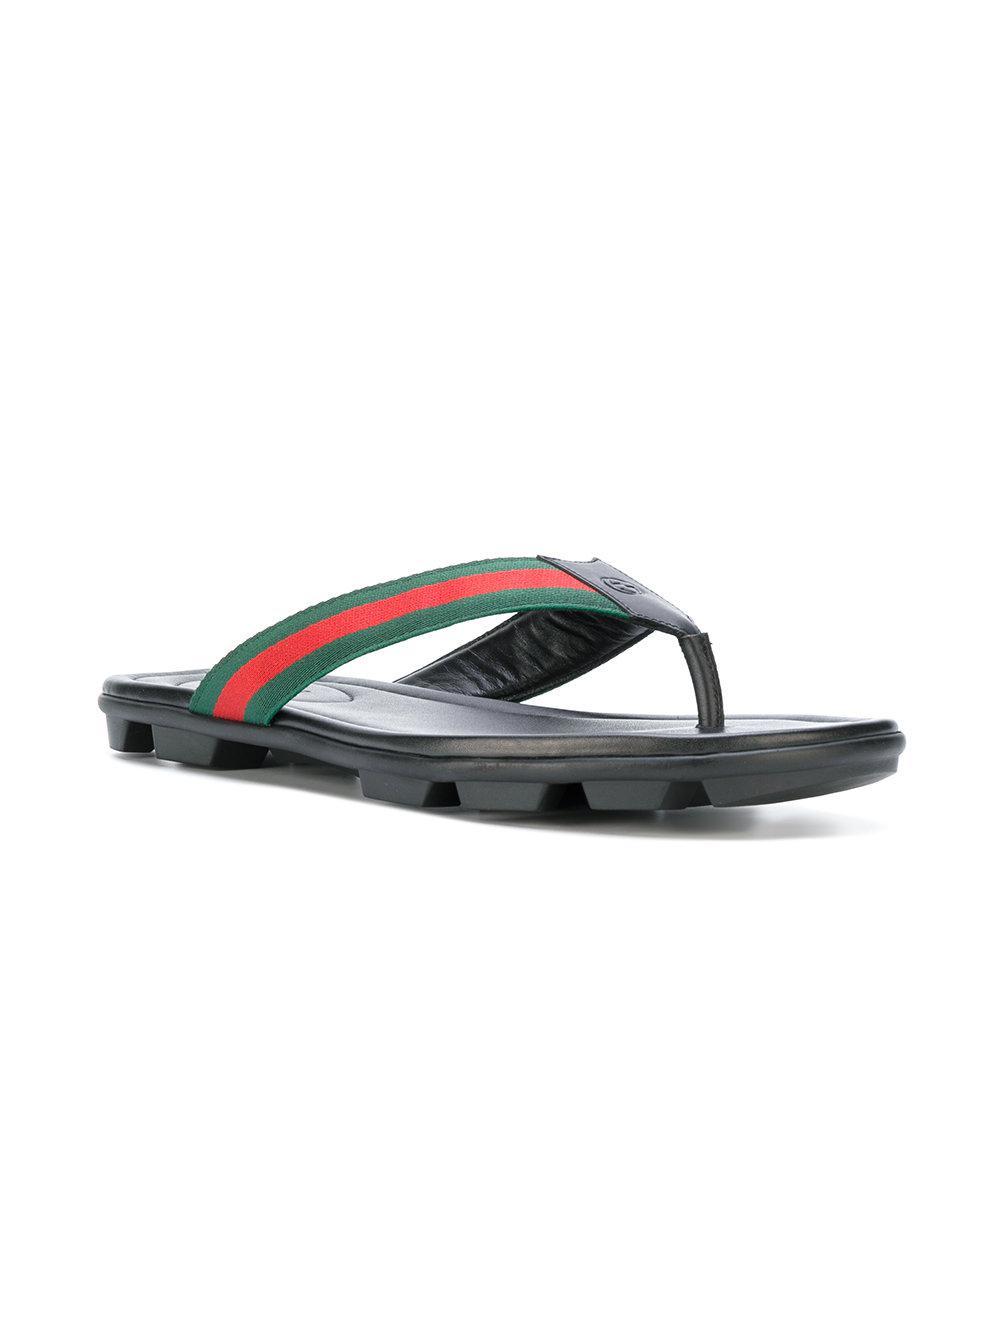 00a1188902efbf Gucci Web Trim Flip Flops in Black for Men - Save 13% - Lyst